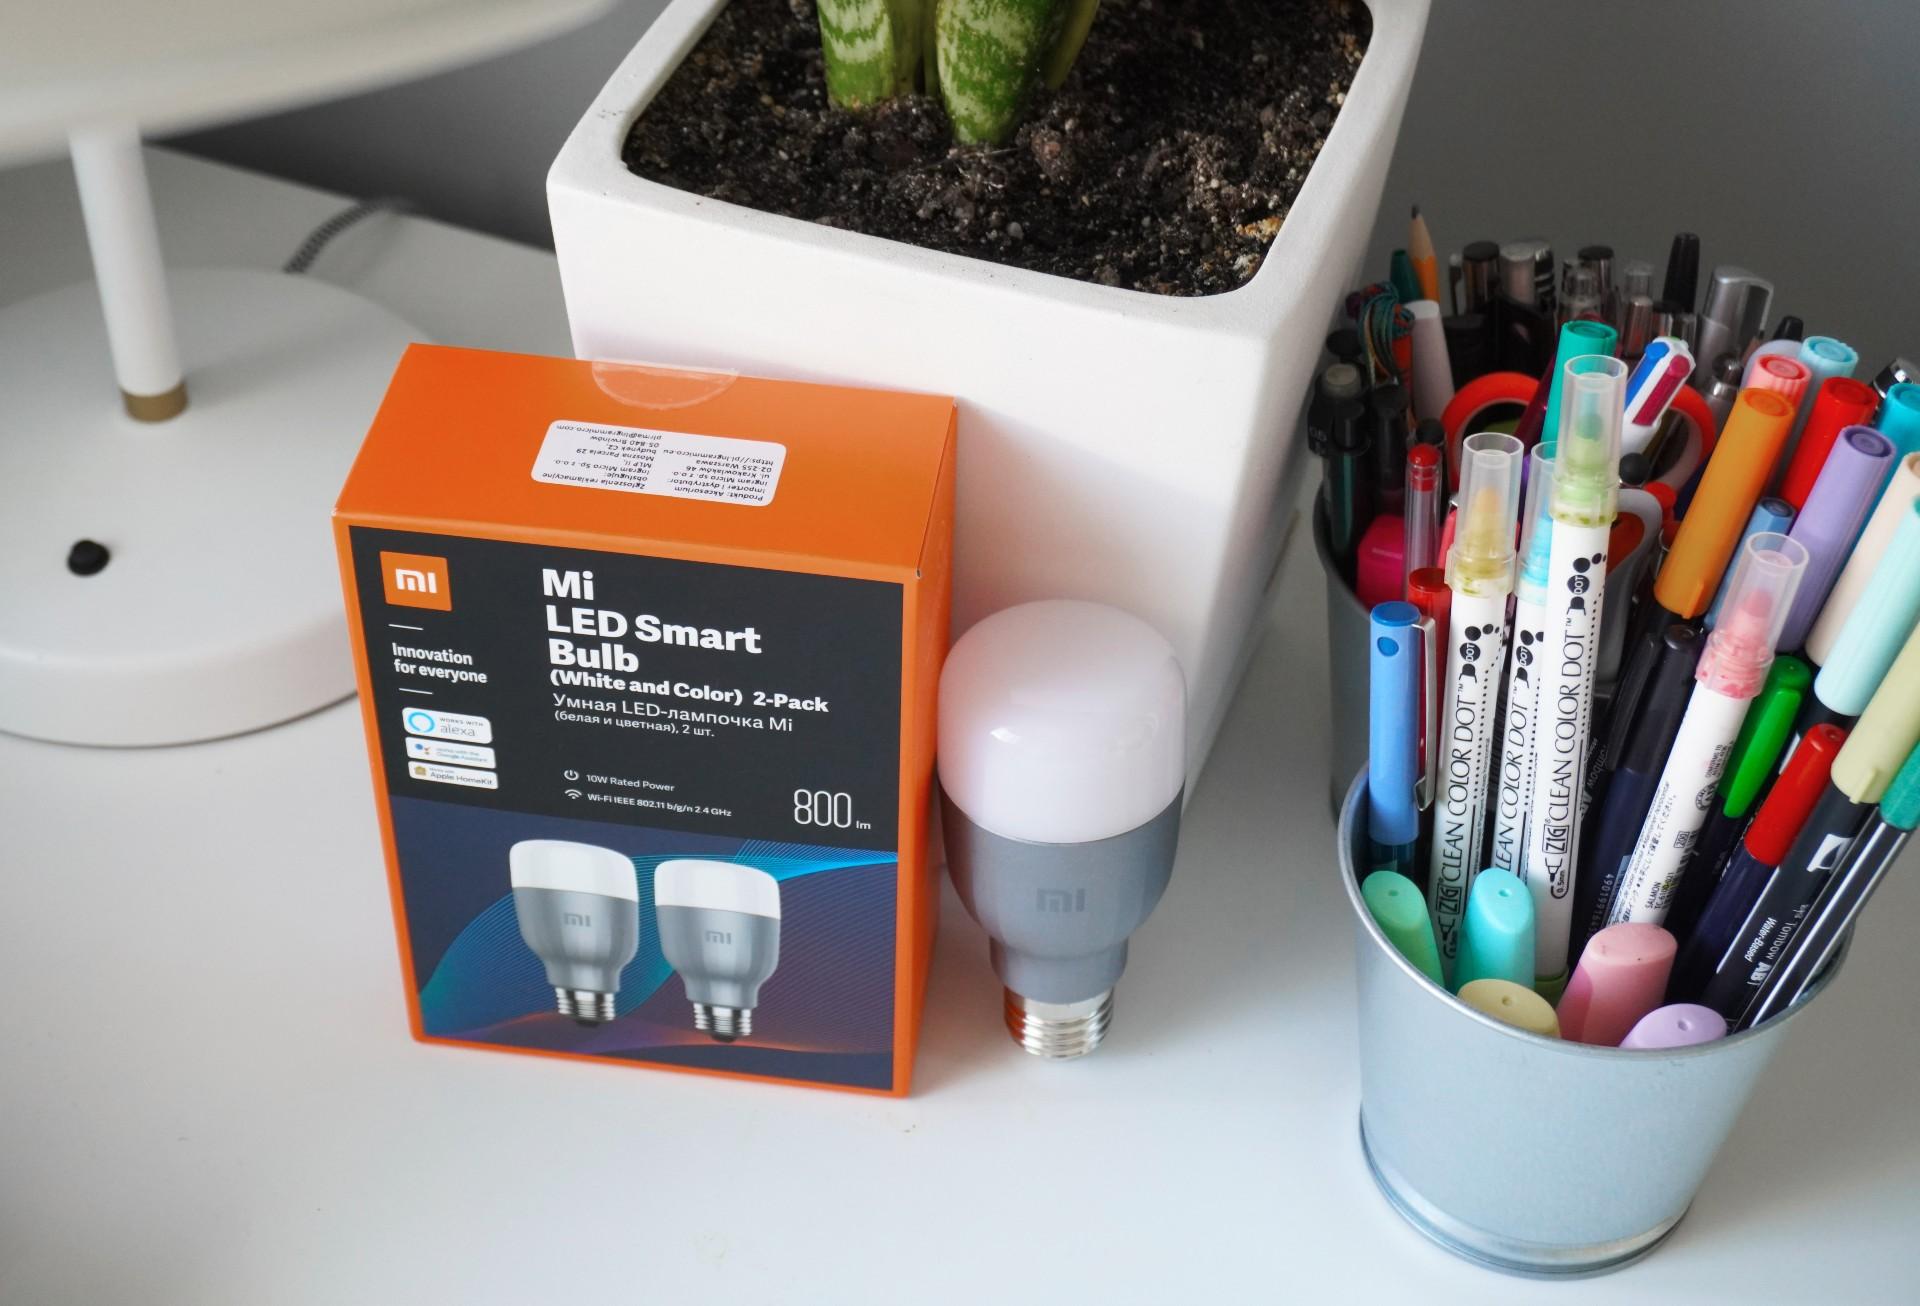 Xiaomi Mi LED Smart Bulb